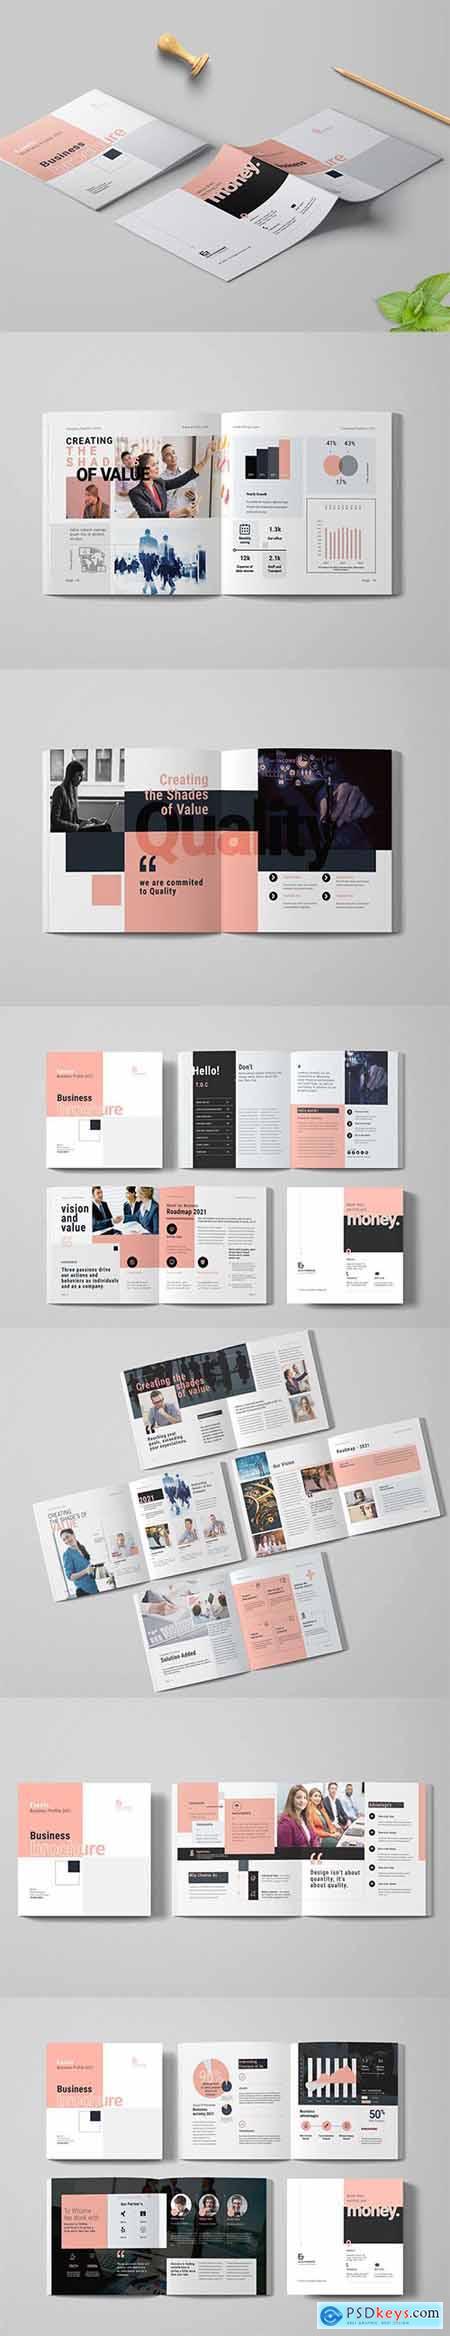 Square Business Brochure NWSGLBK